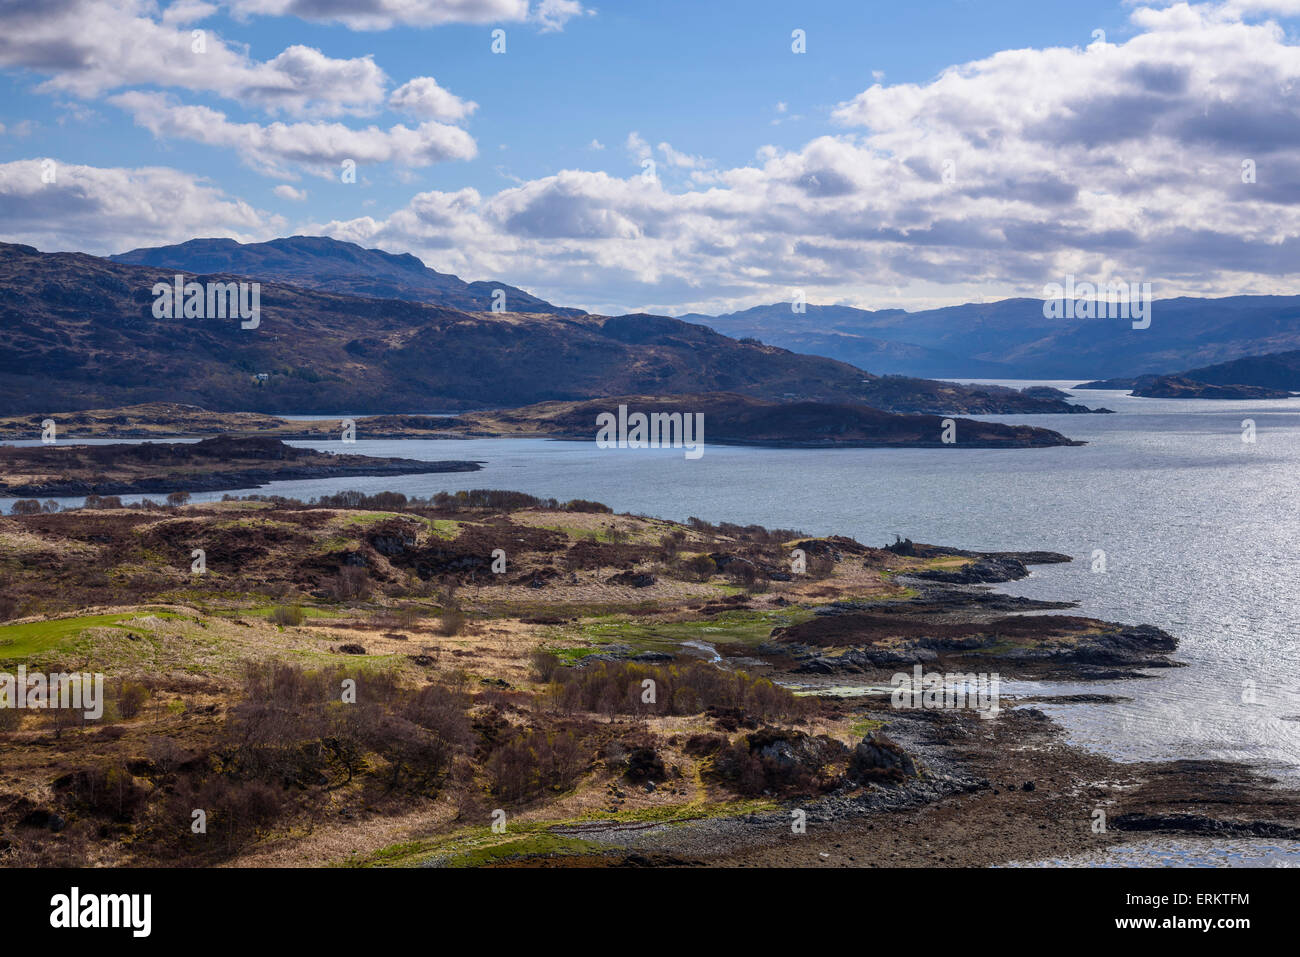 Loch Sunart, Ardnamurchan Peninsula, Lochaber, Highlands, Scotland - Stock Image